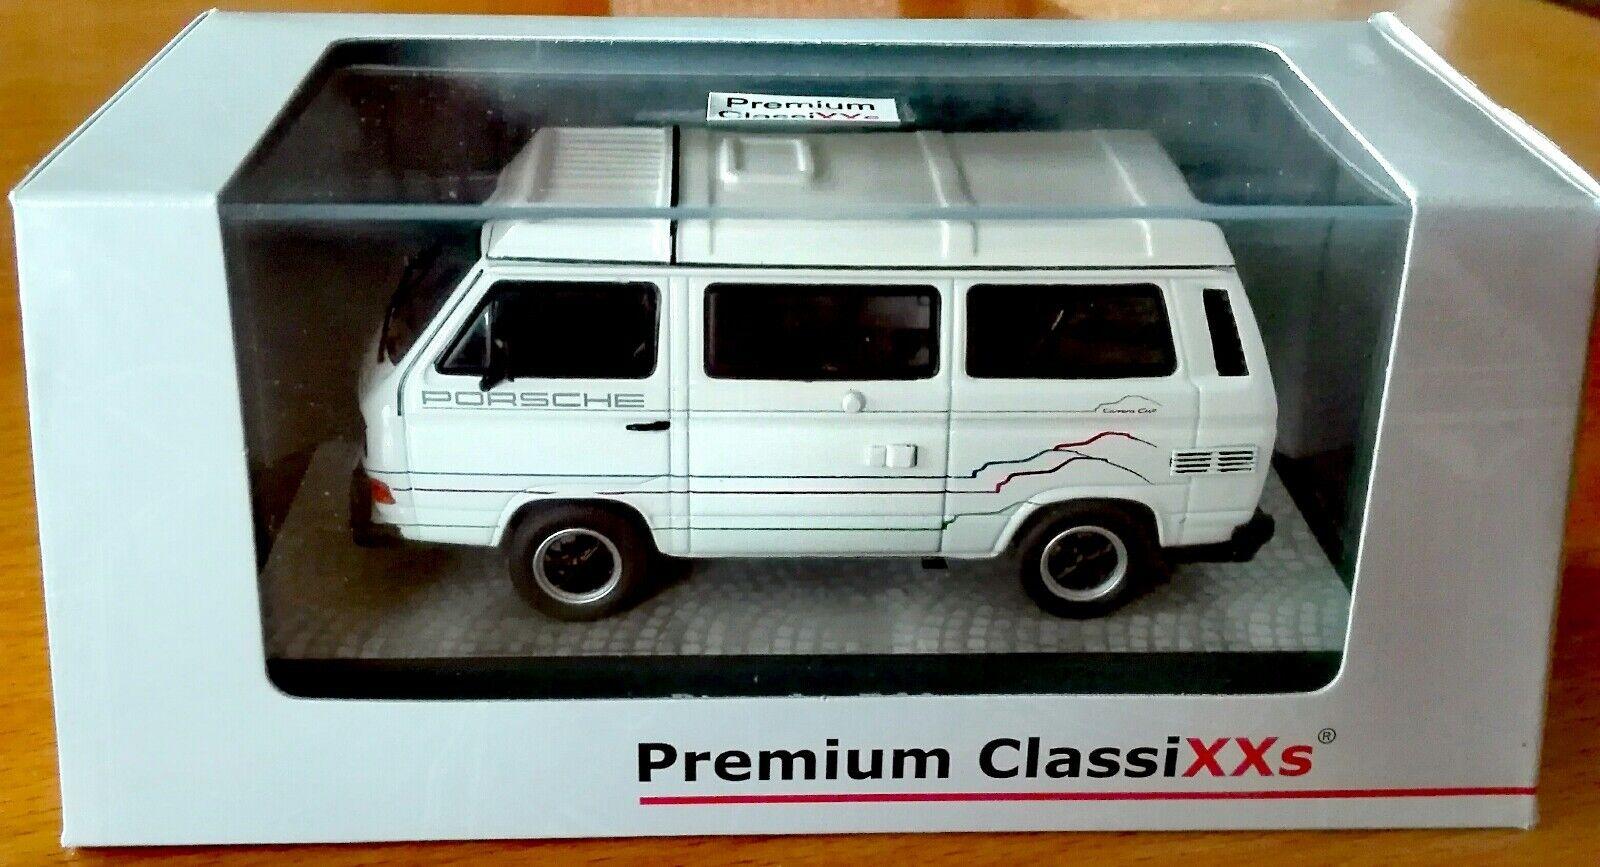 PORSCHE b32 VW BUS t3 CAMPEGGIO Carrera Cup Premium ClassiXXs 1/43 OVP RAR